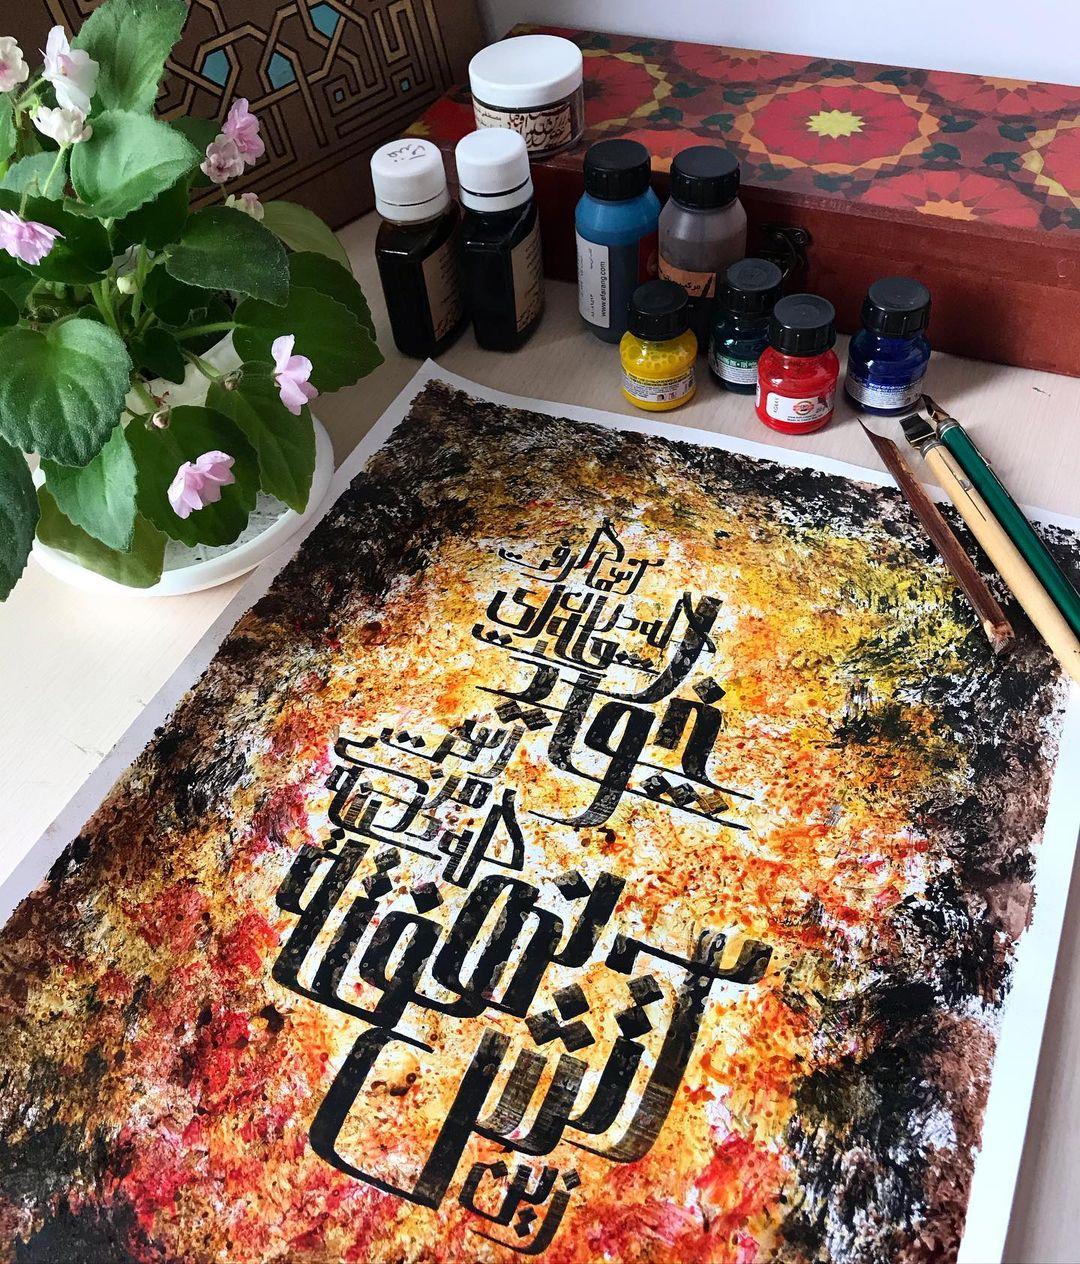 Karya Kaligrafi  زین آتش نهفته که در سینه ی  من است خورشید، شعلهایست که در آسمان گرفت حافظ  چو…- Ne Javaher